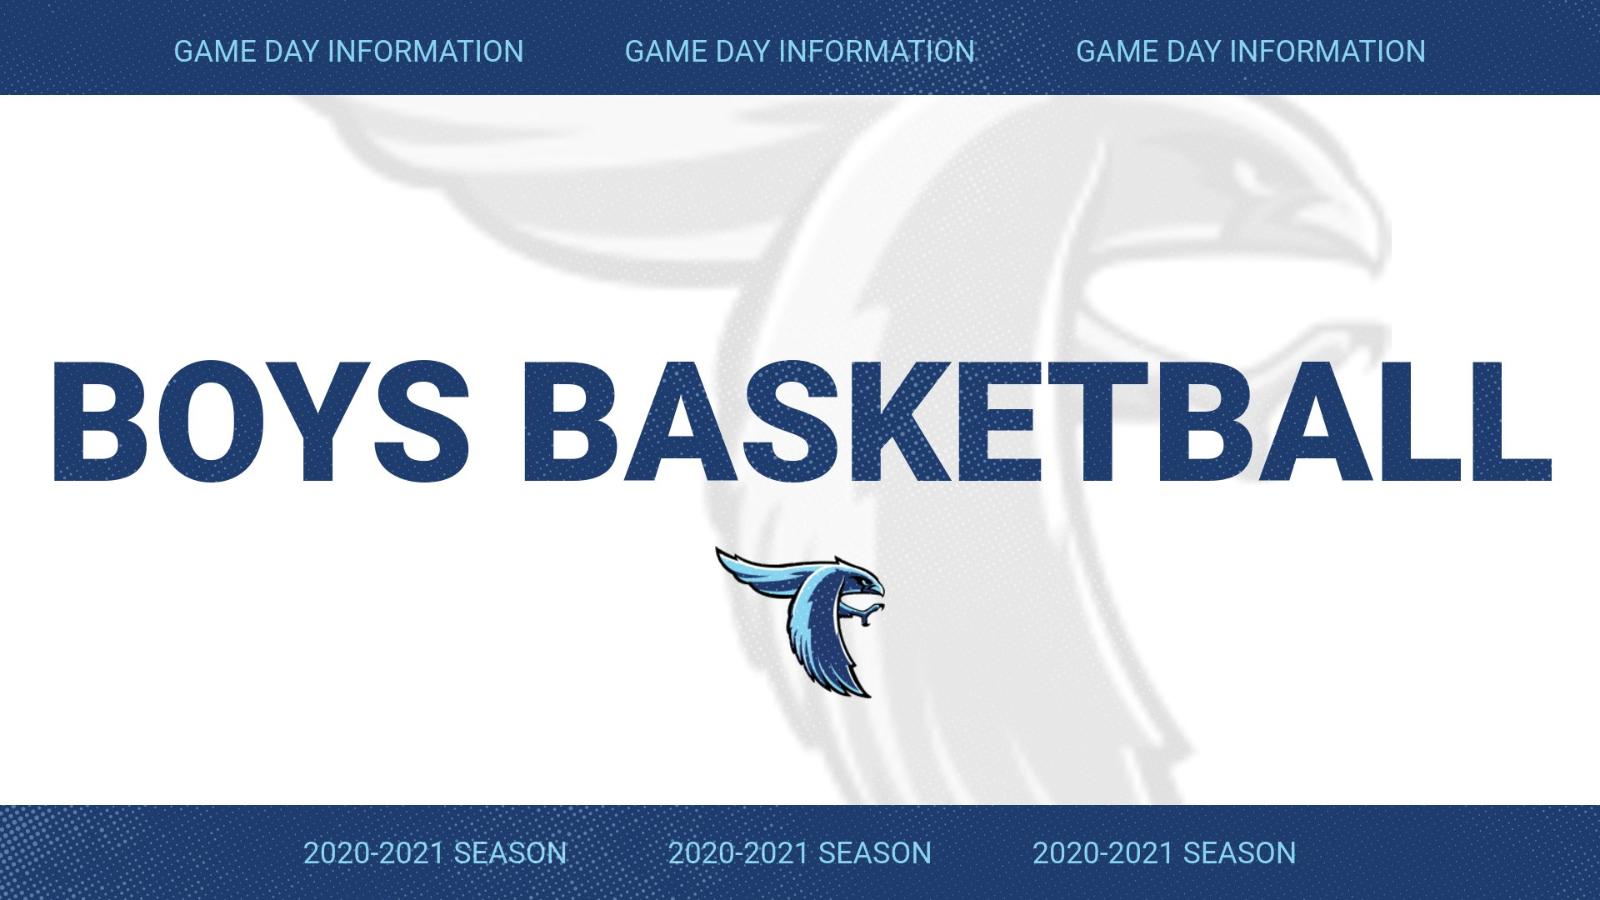 GAME NOTES: Boys Basketball vs. Franklin Community 2/12